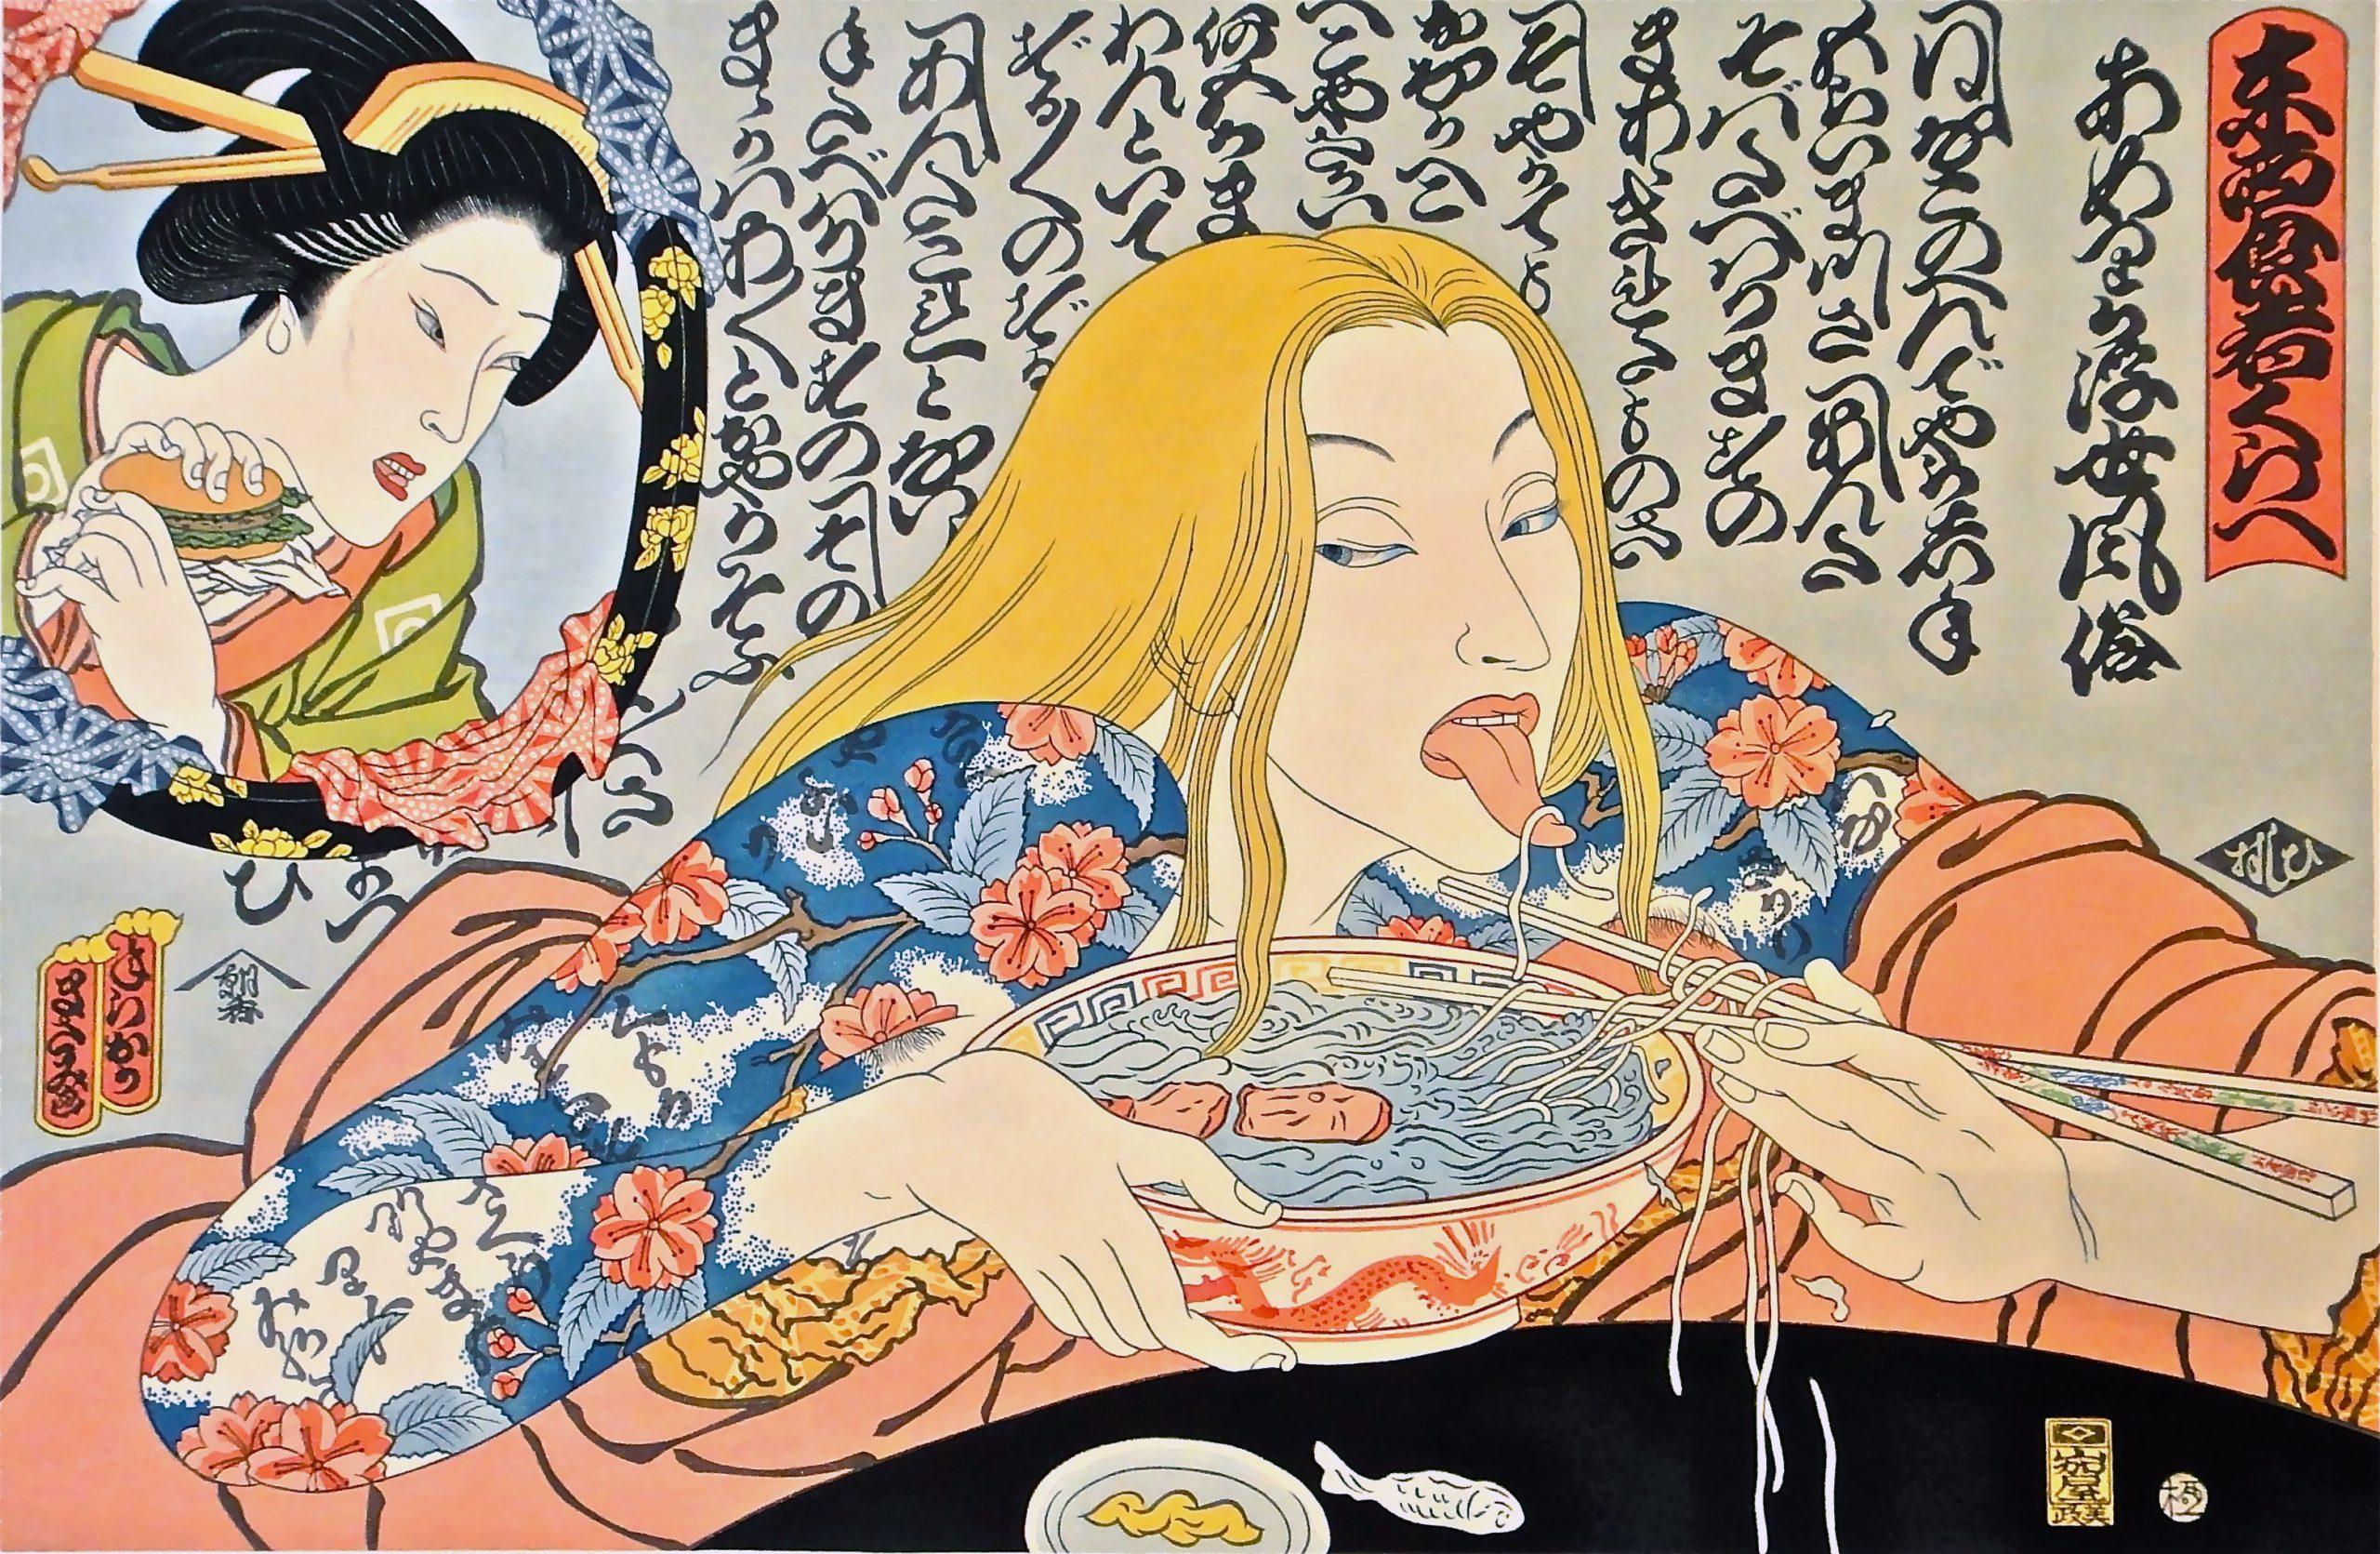 Mcdonald's Hamburgers Invading Japan/tattooed Woman And Geisha Iii by Masami Teraoka